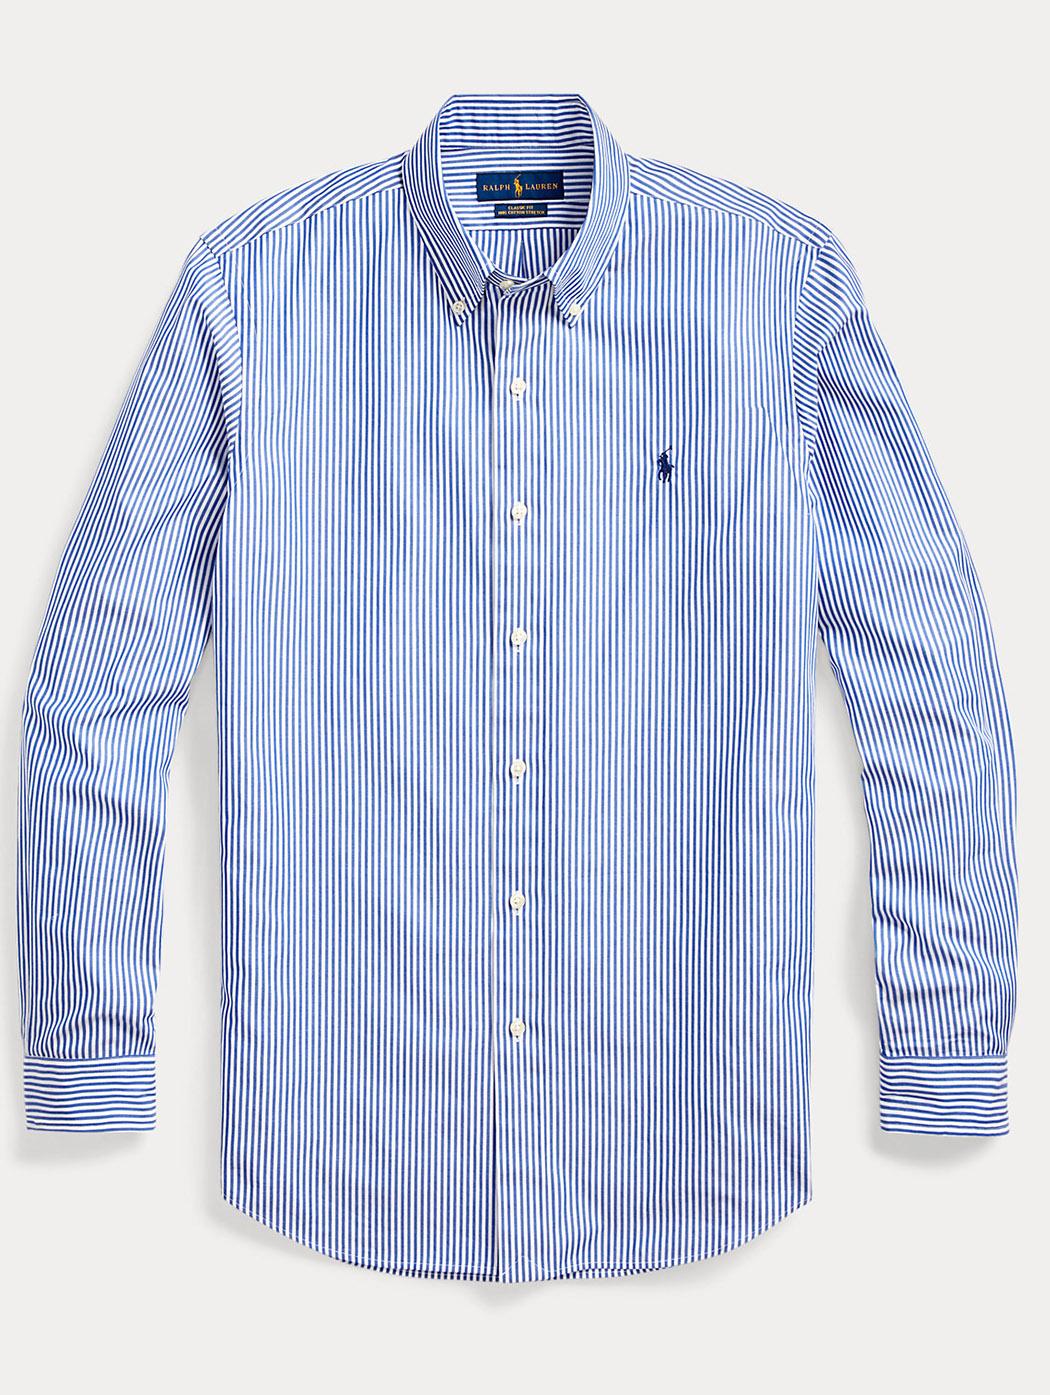 Camicia in popeline a righe Slim-Fit 71078 008